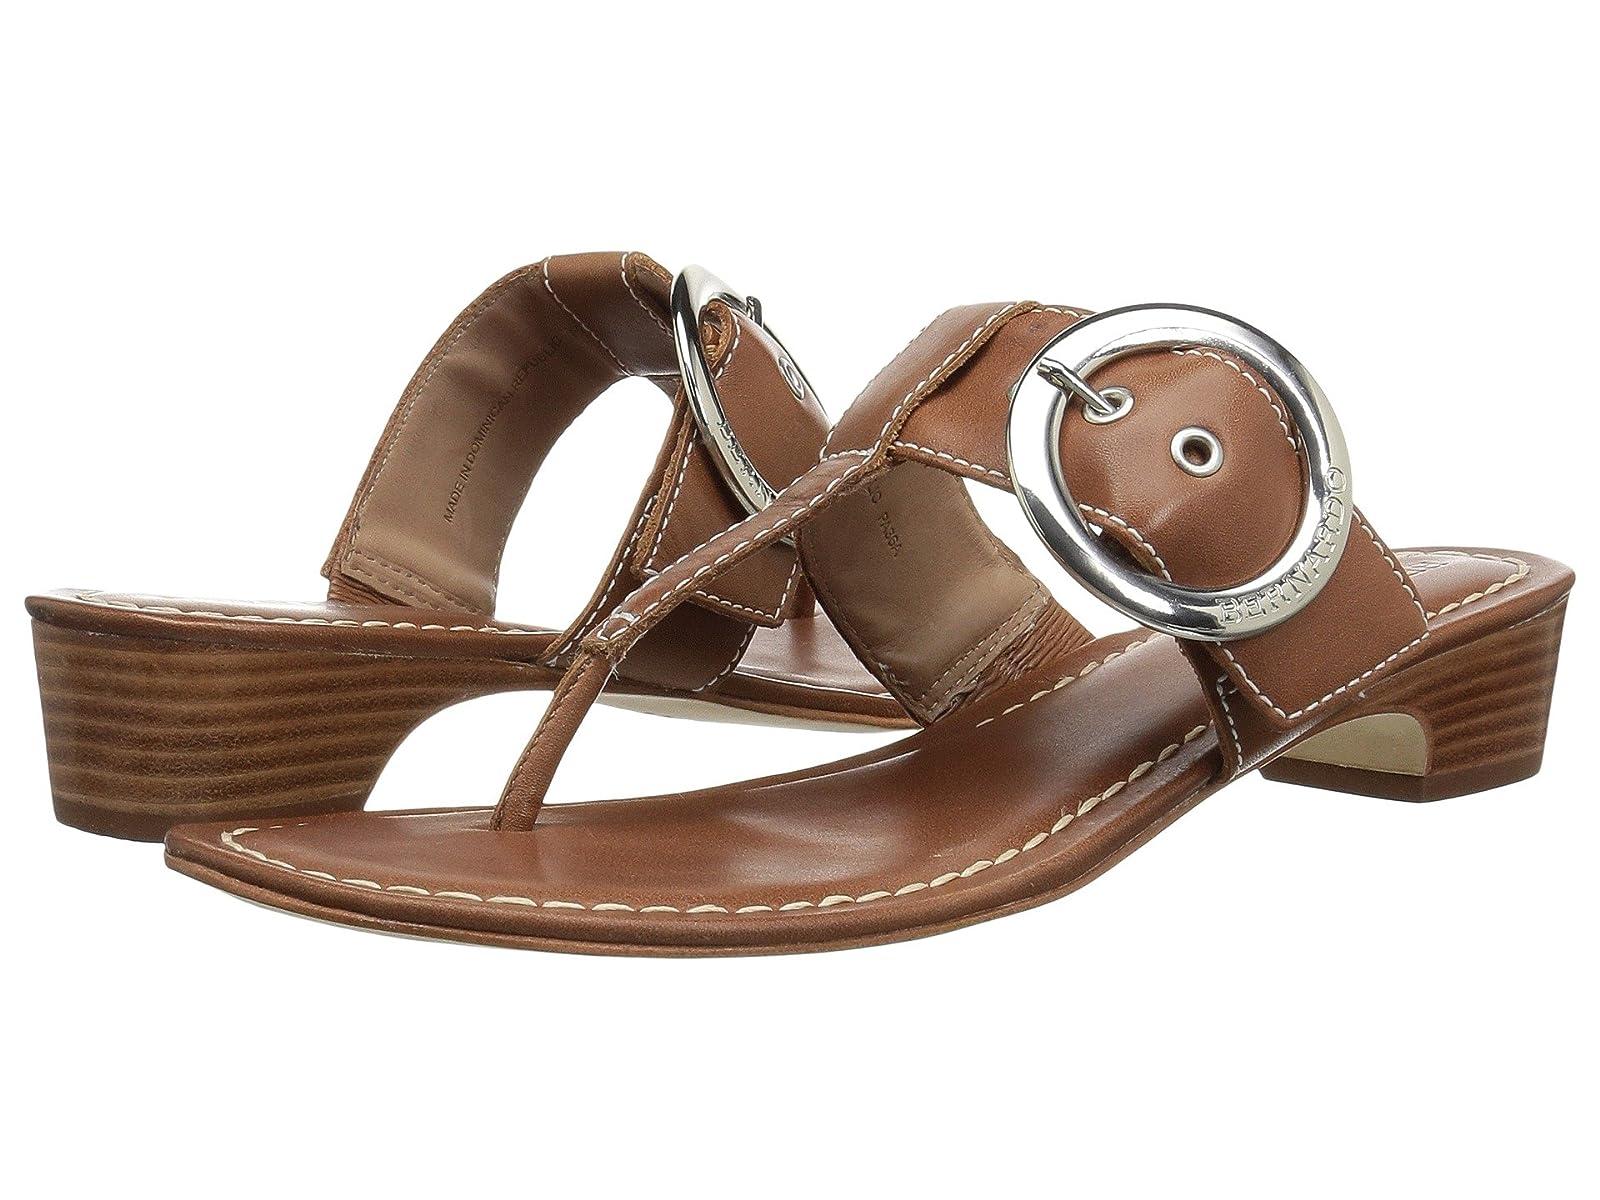 Bernardo GraceCheap and distinctive eye-catching shoes